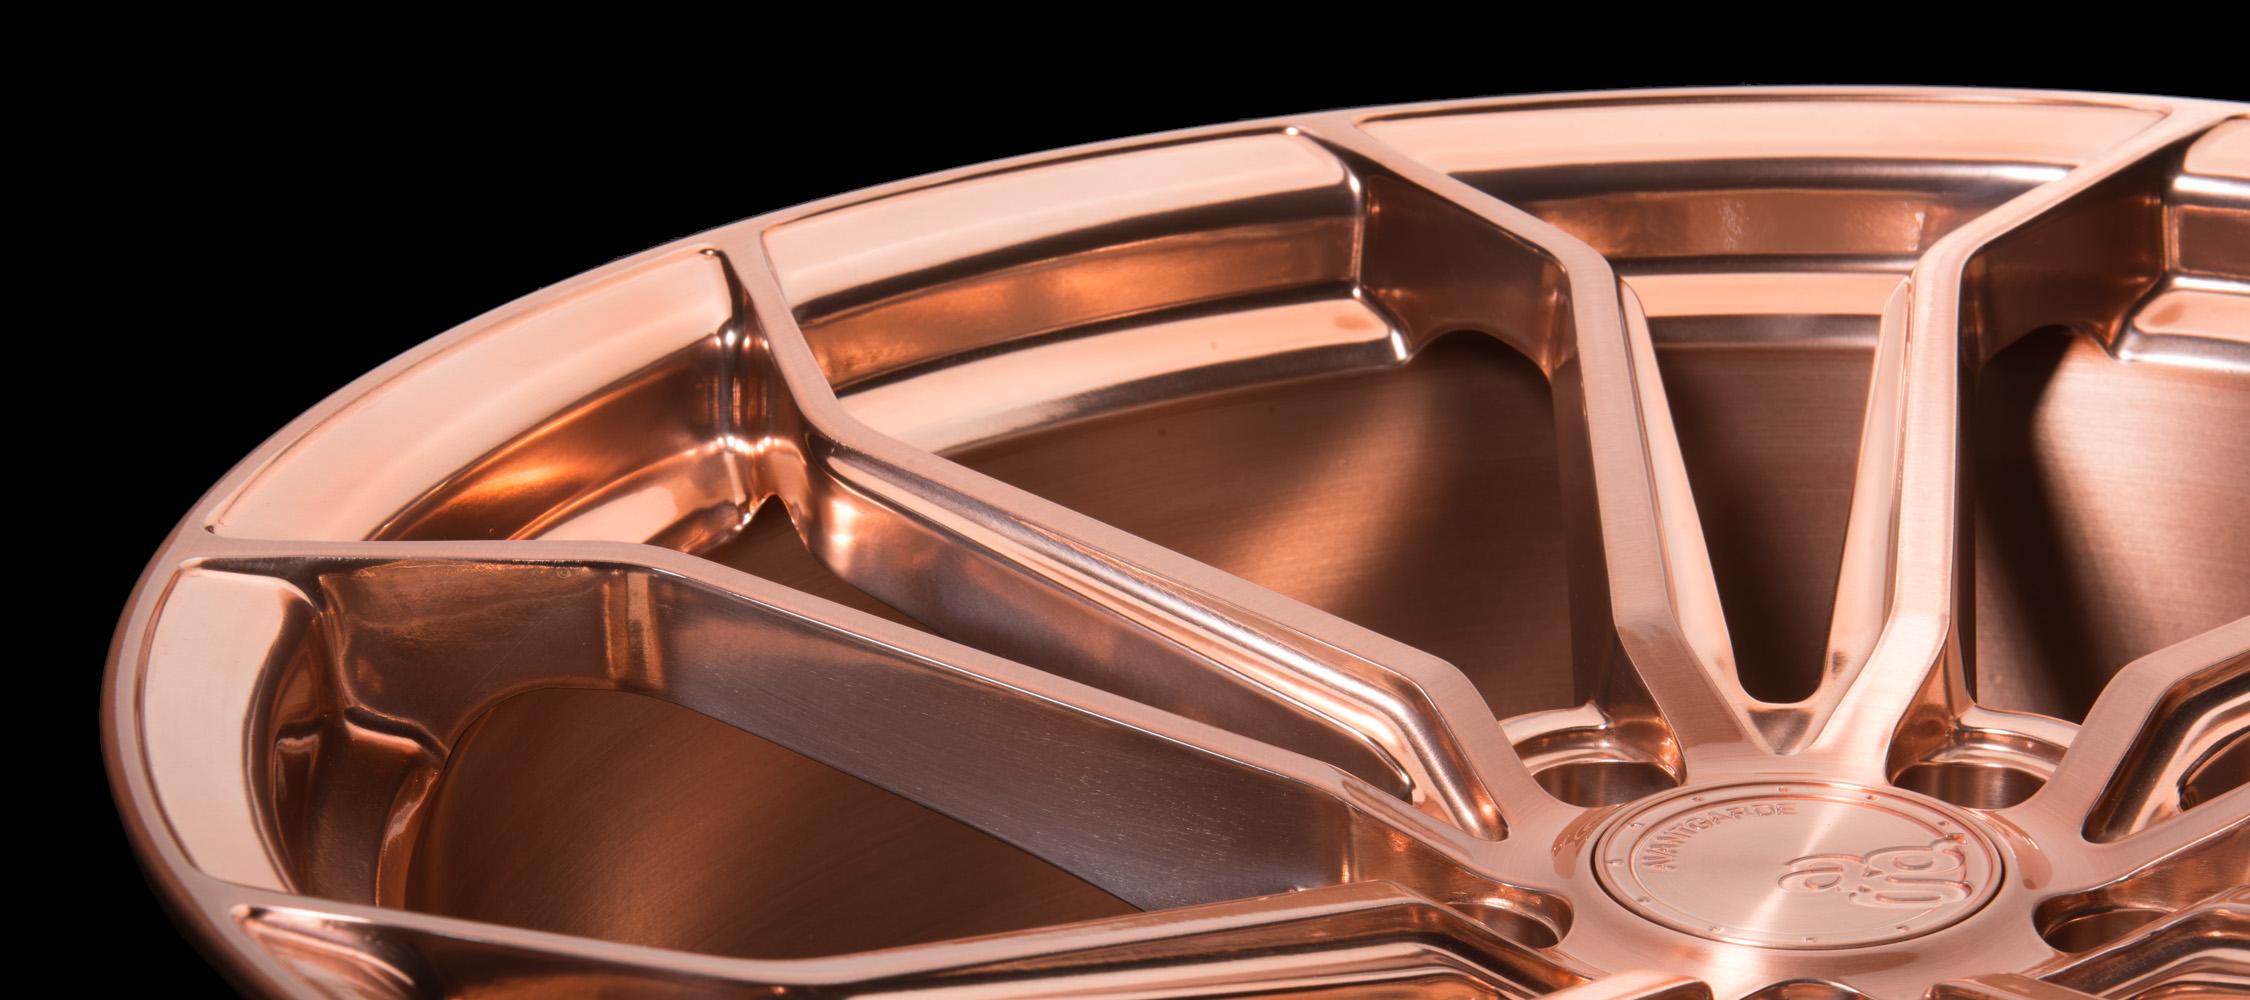 finish-brushed-copper-ag-m632-1800x700-4